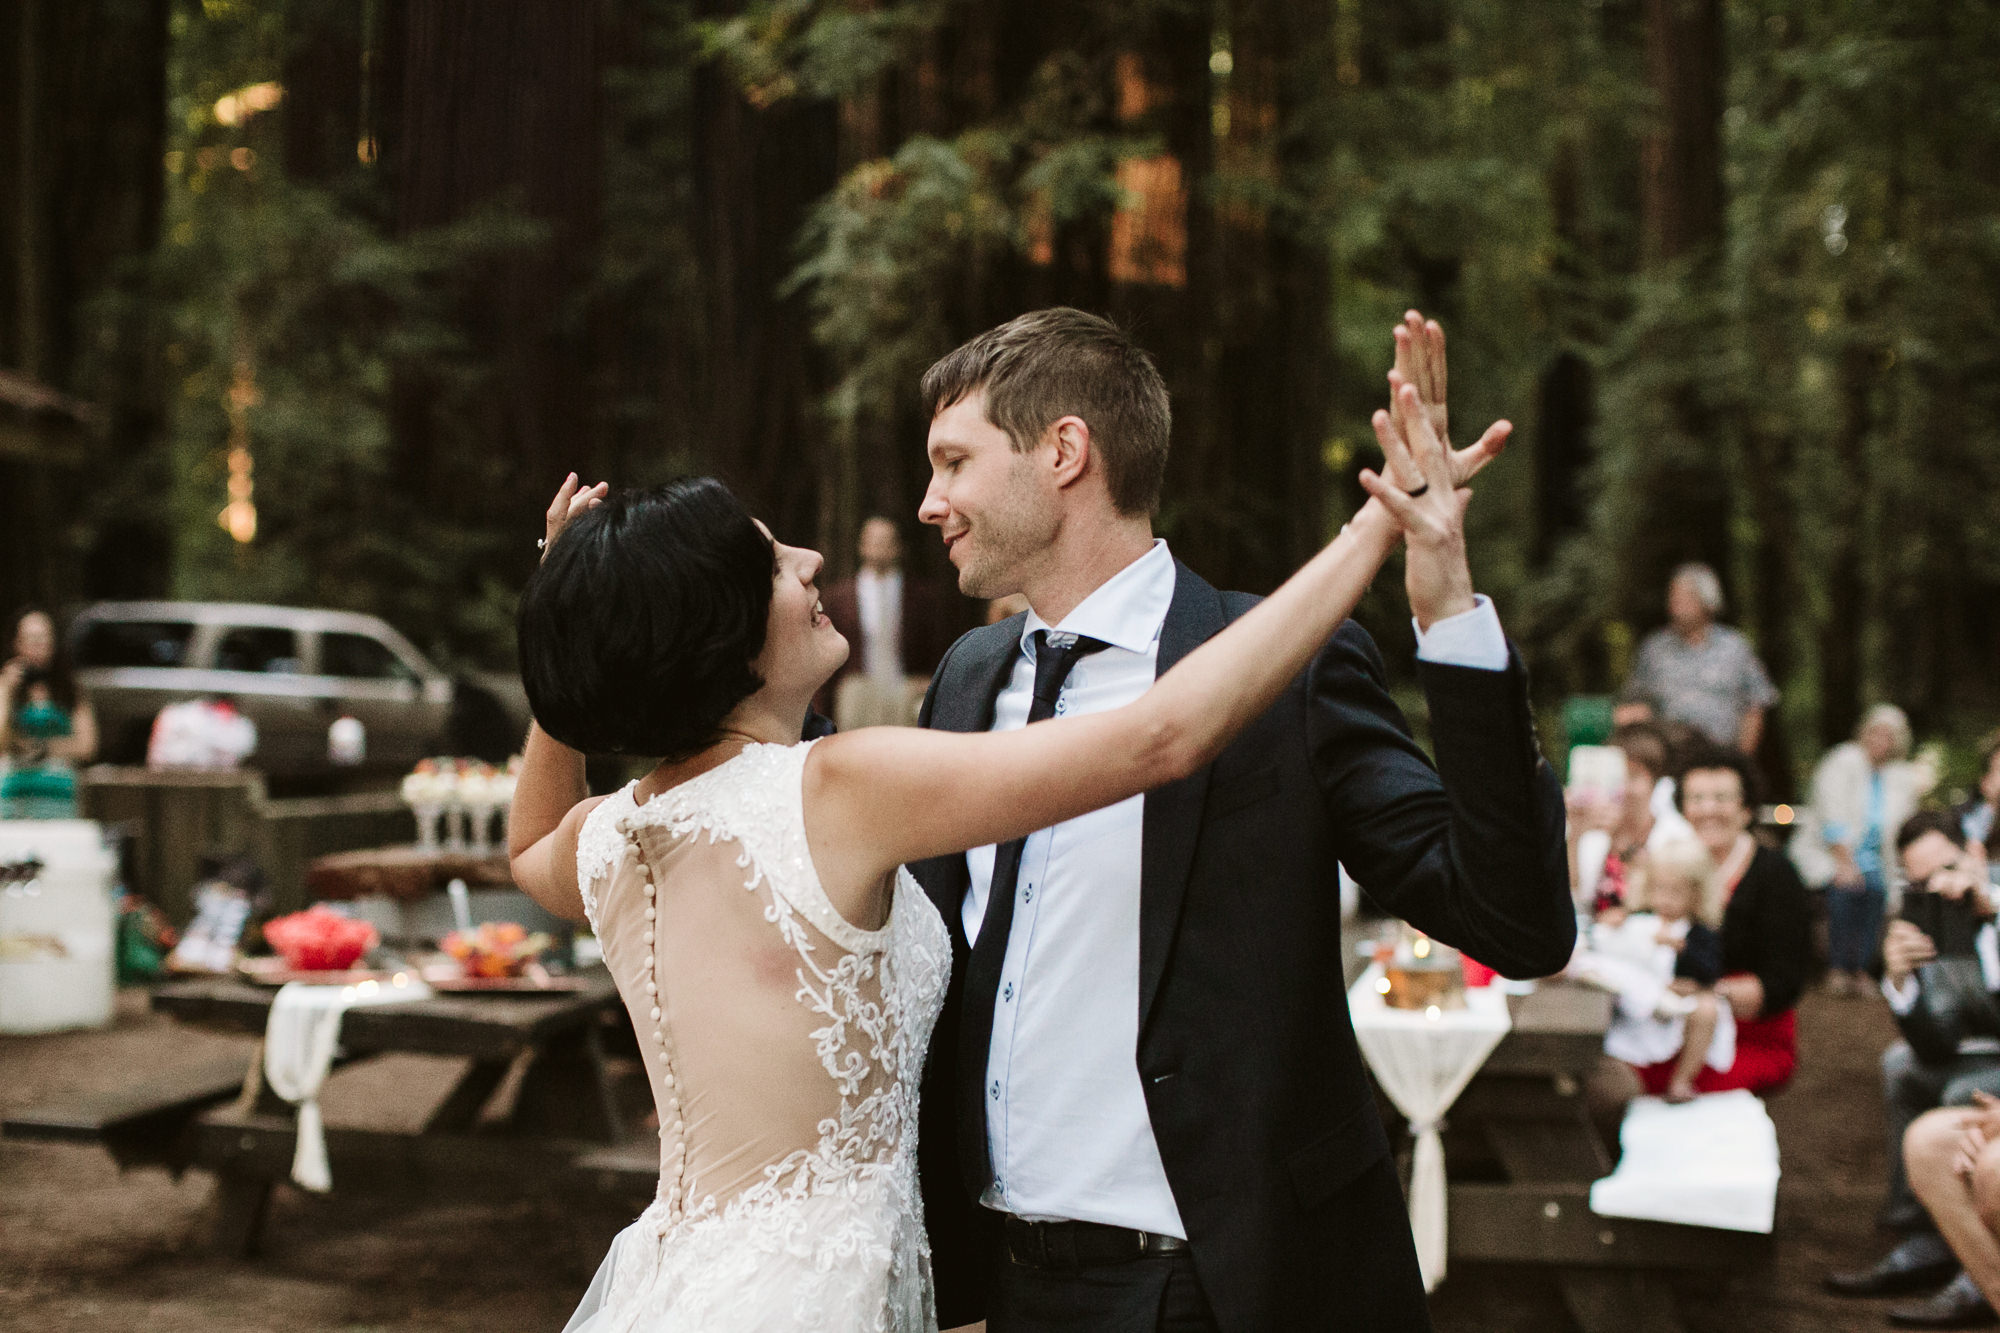 California-wedding-photographer-alfonso-flores-pamplin-groove-332.jpg